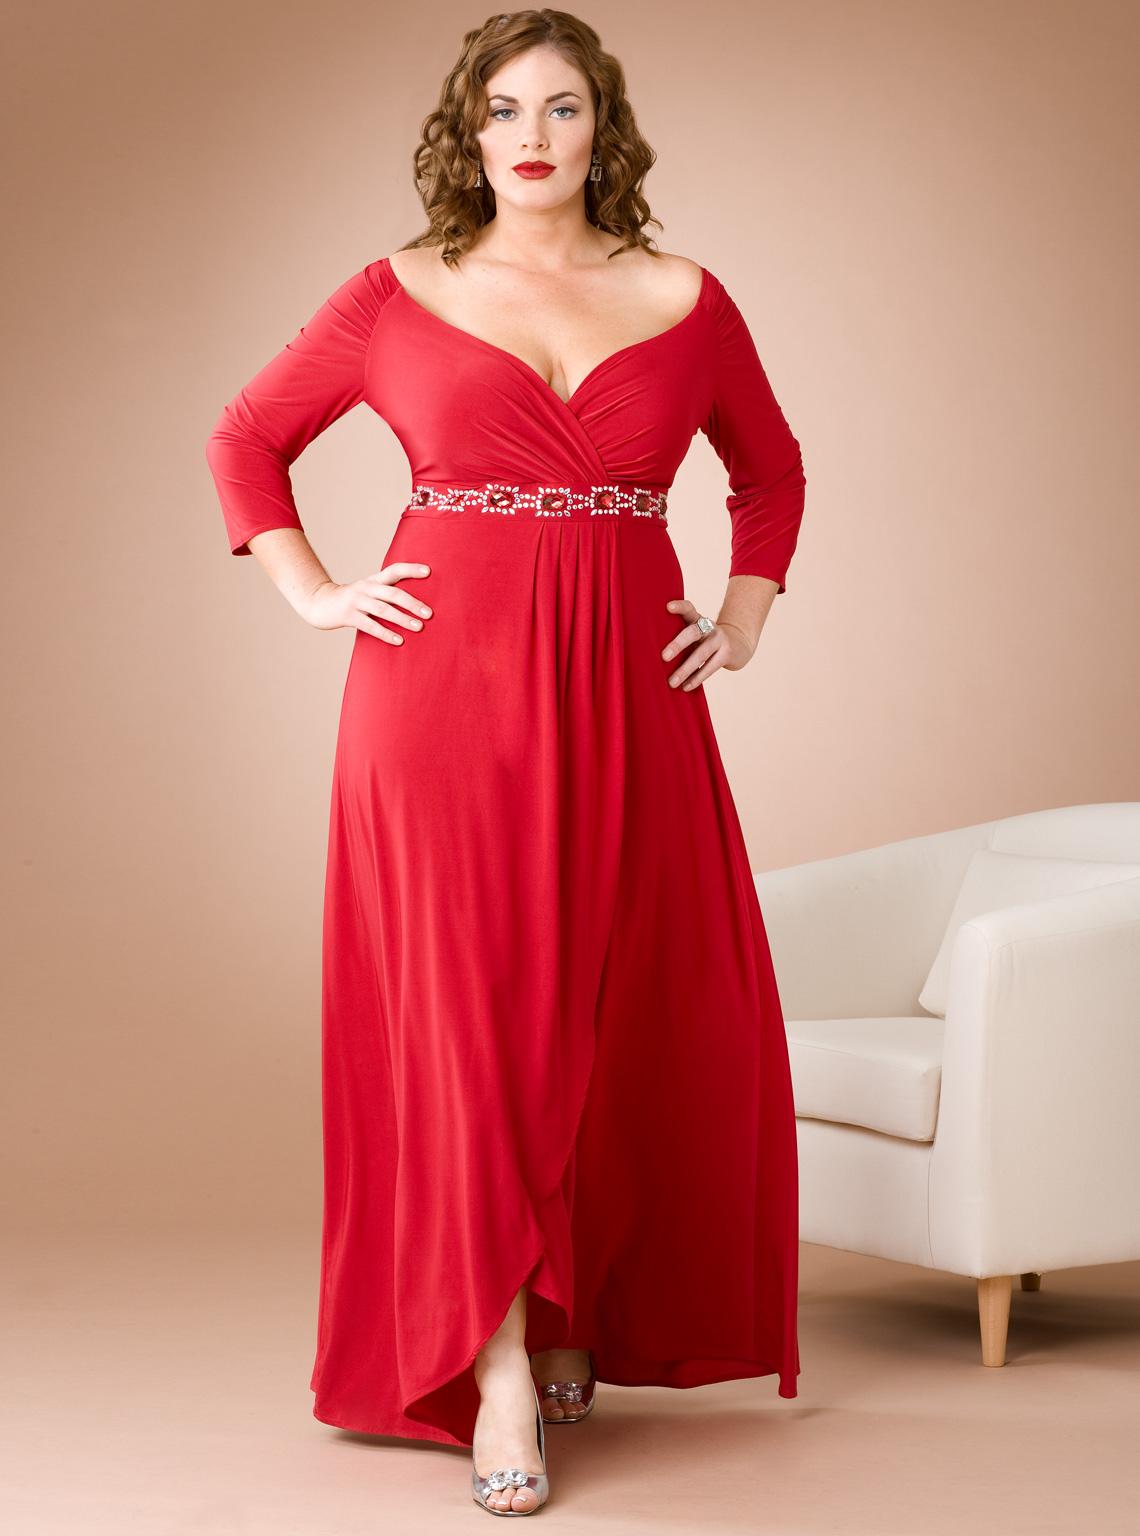 Large size clothing for women